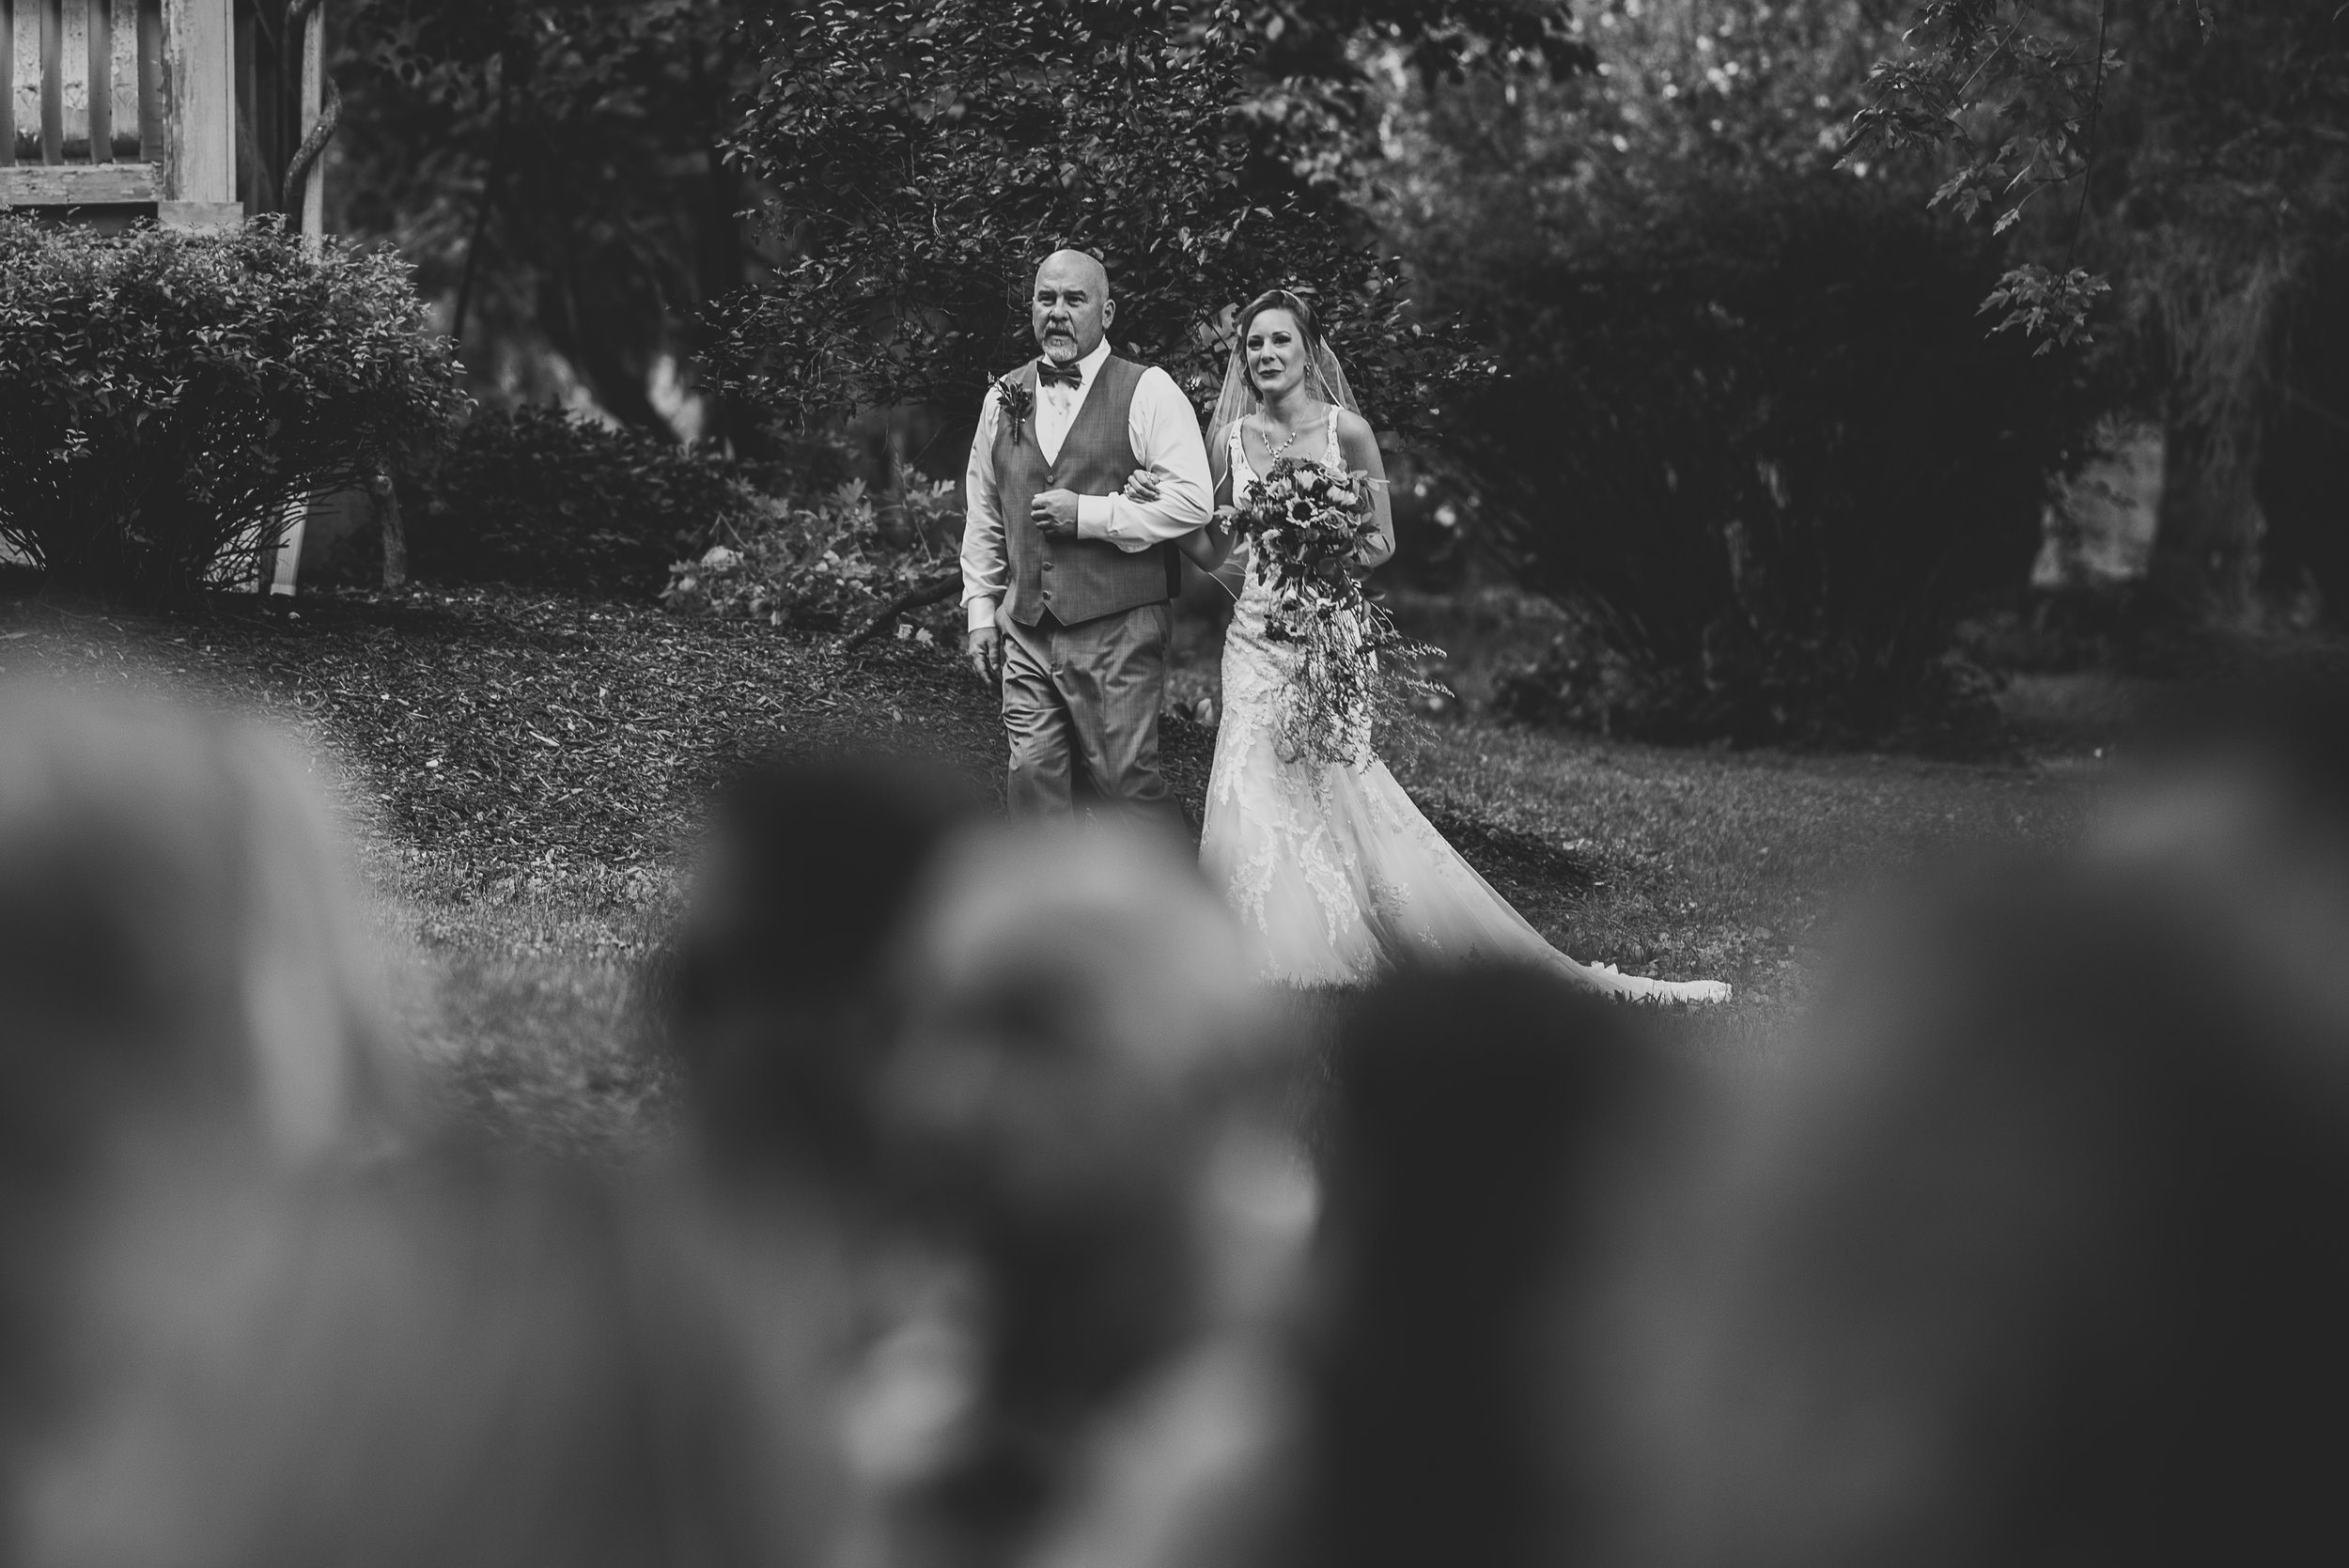 042ninalilyphoto-groveatkemptonwedding-hicksblog.jpg